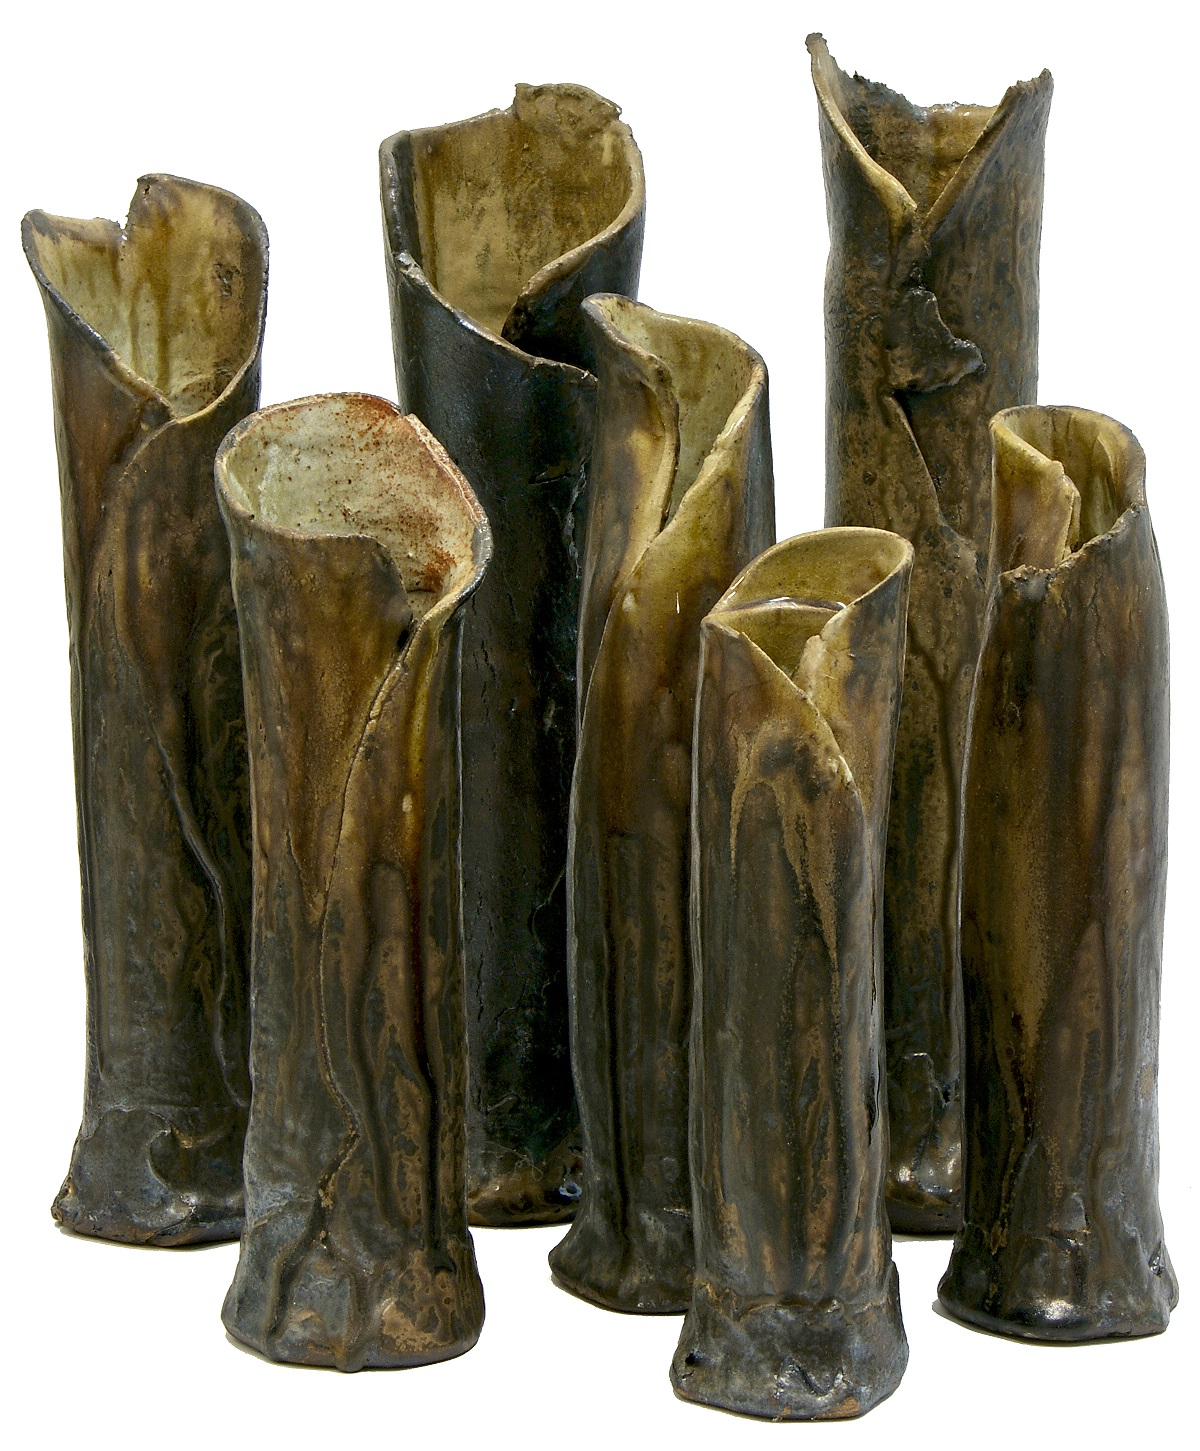 Milton Moon, After The Burning, folded vases, stoneware, ash glaze, tallest 35cm, 2014. Photo courtesy of Aptos Cruz Galleries.jpg